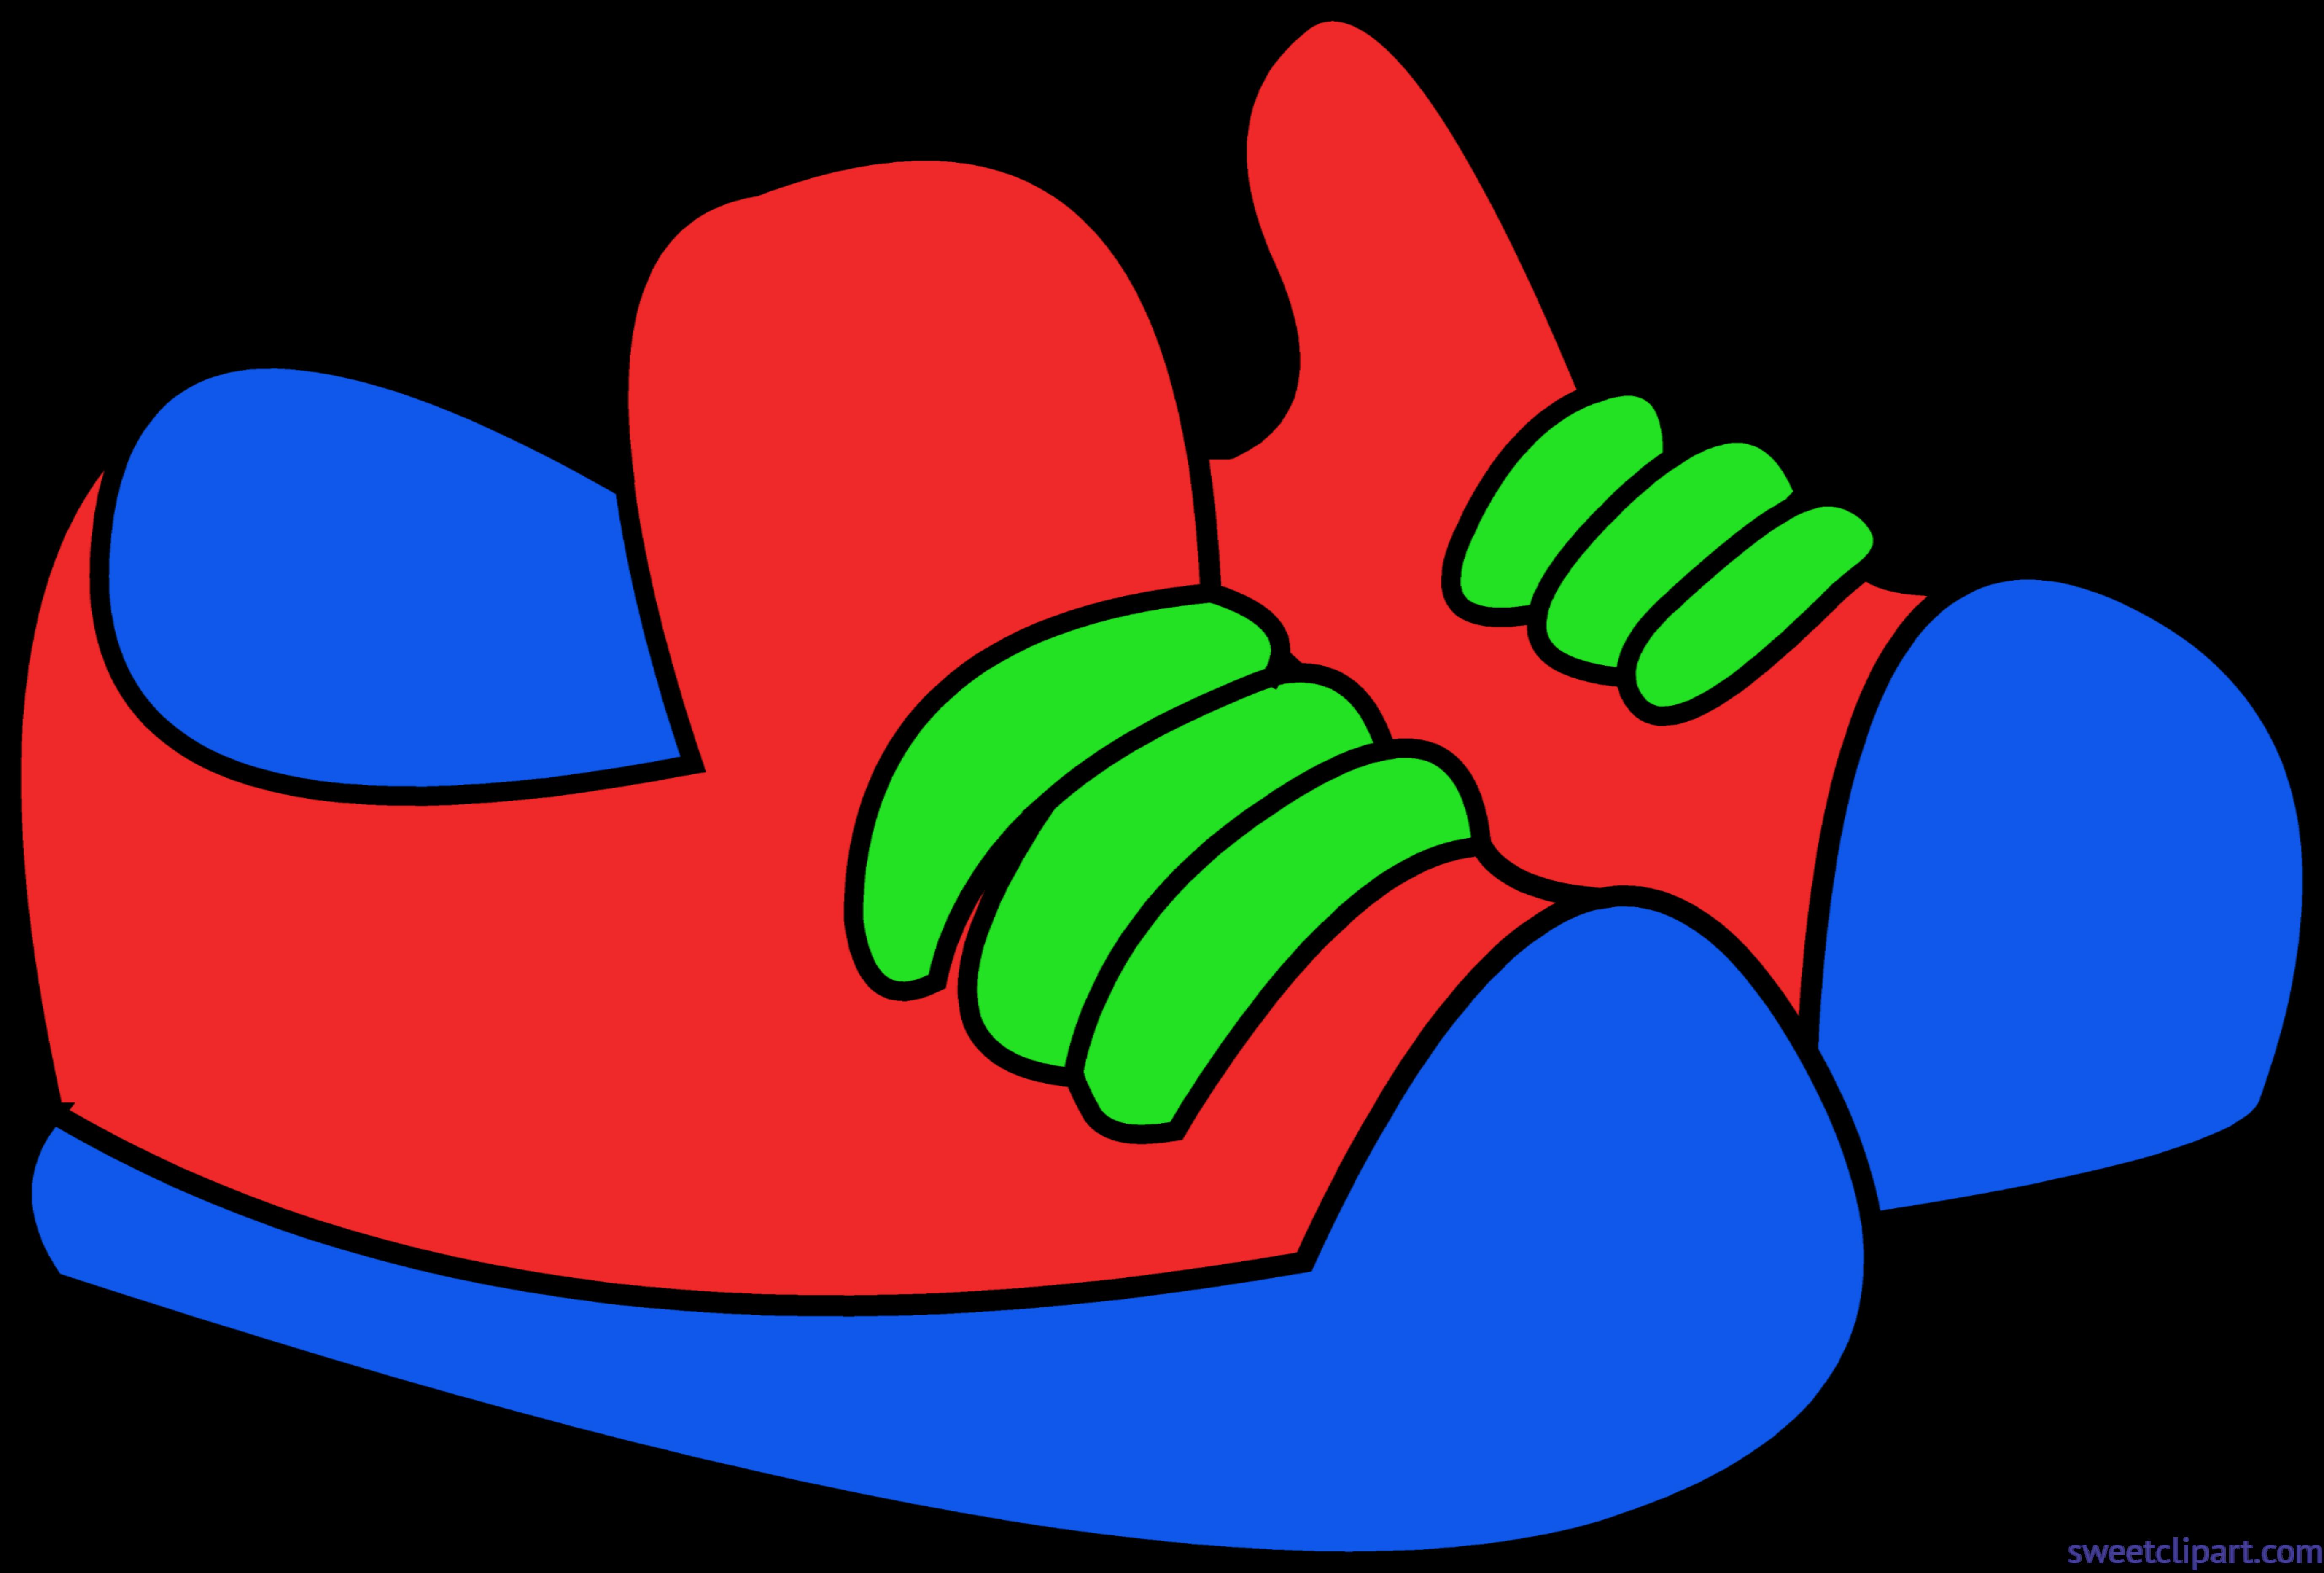 Sock clipart shoe, Sock shoe Transparent FREE for download.